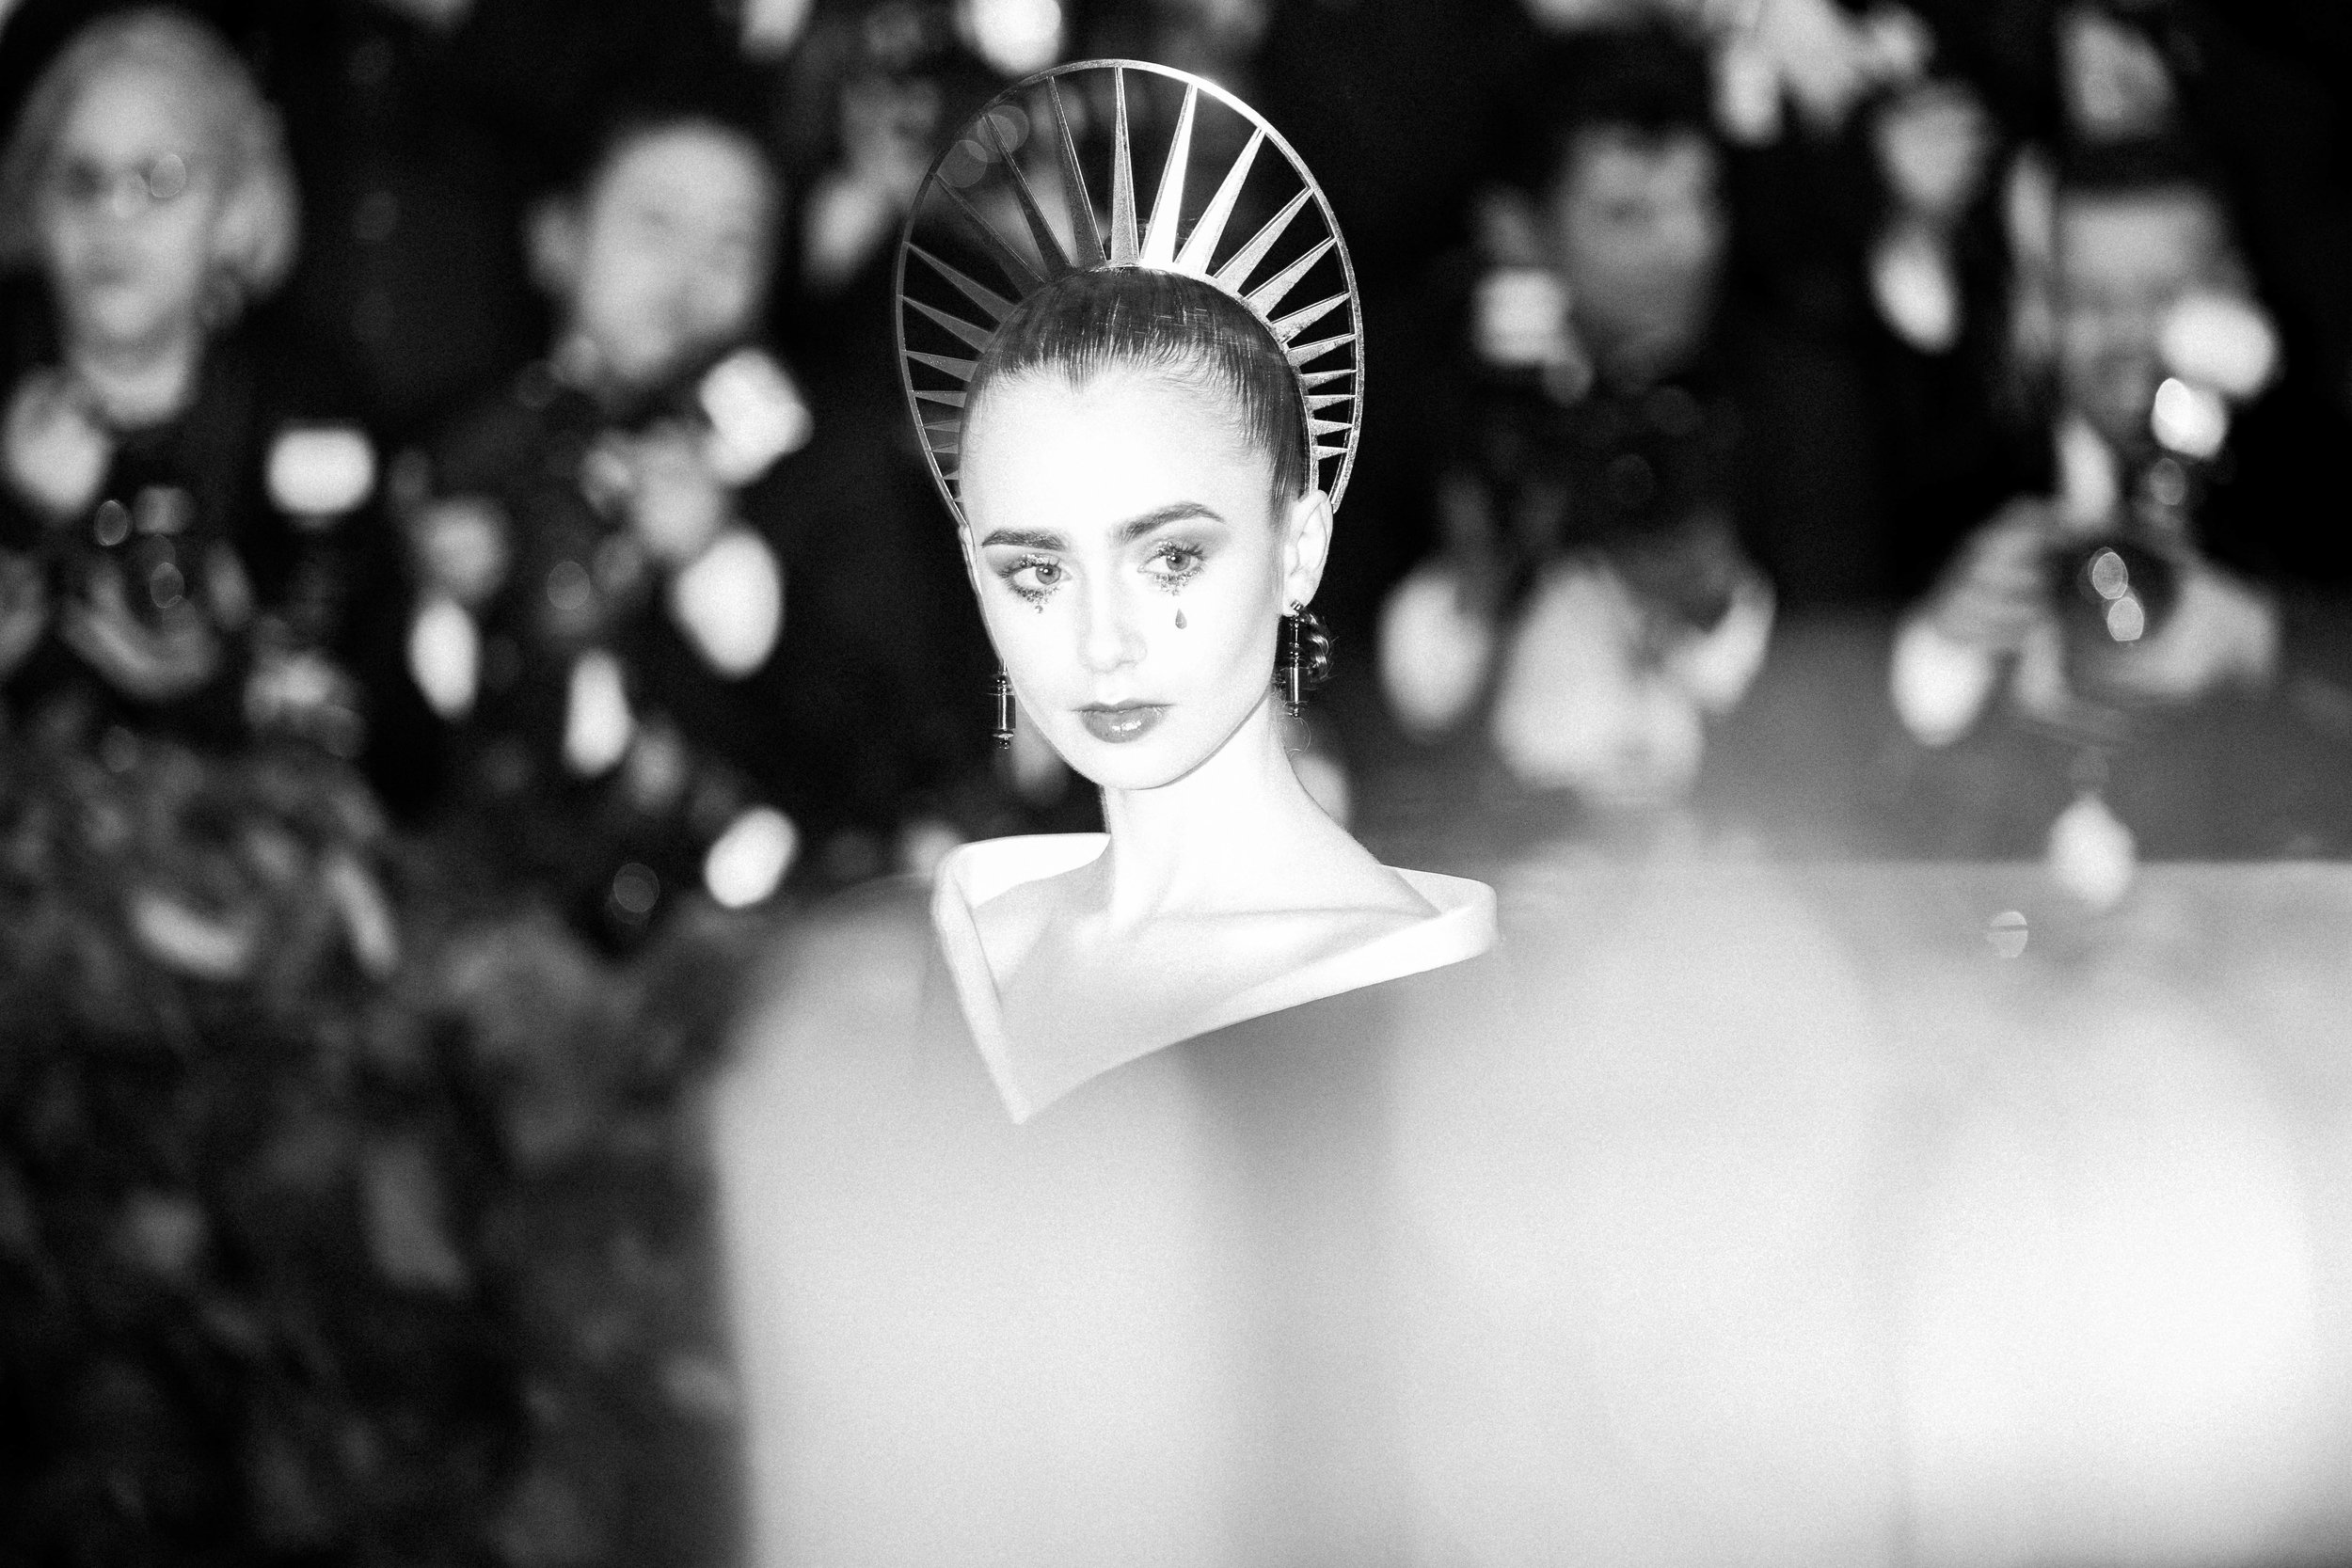 Lily Collins at the 2018 Met Gala. Photograph by Siyu Tang.